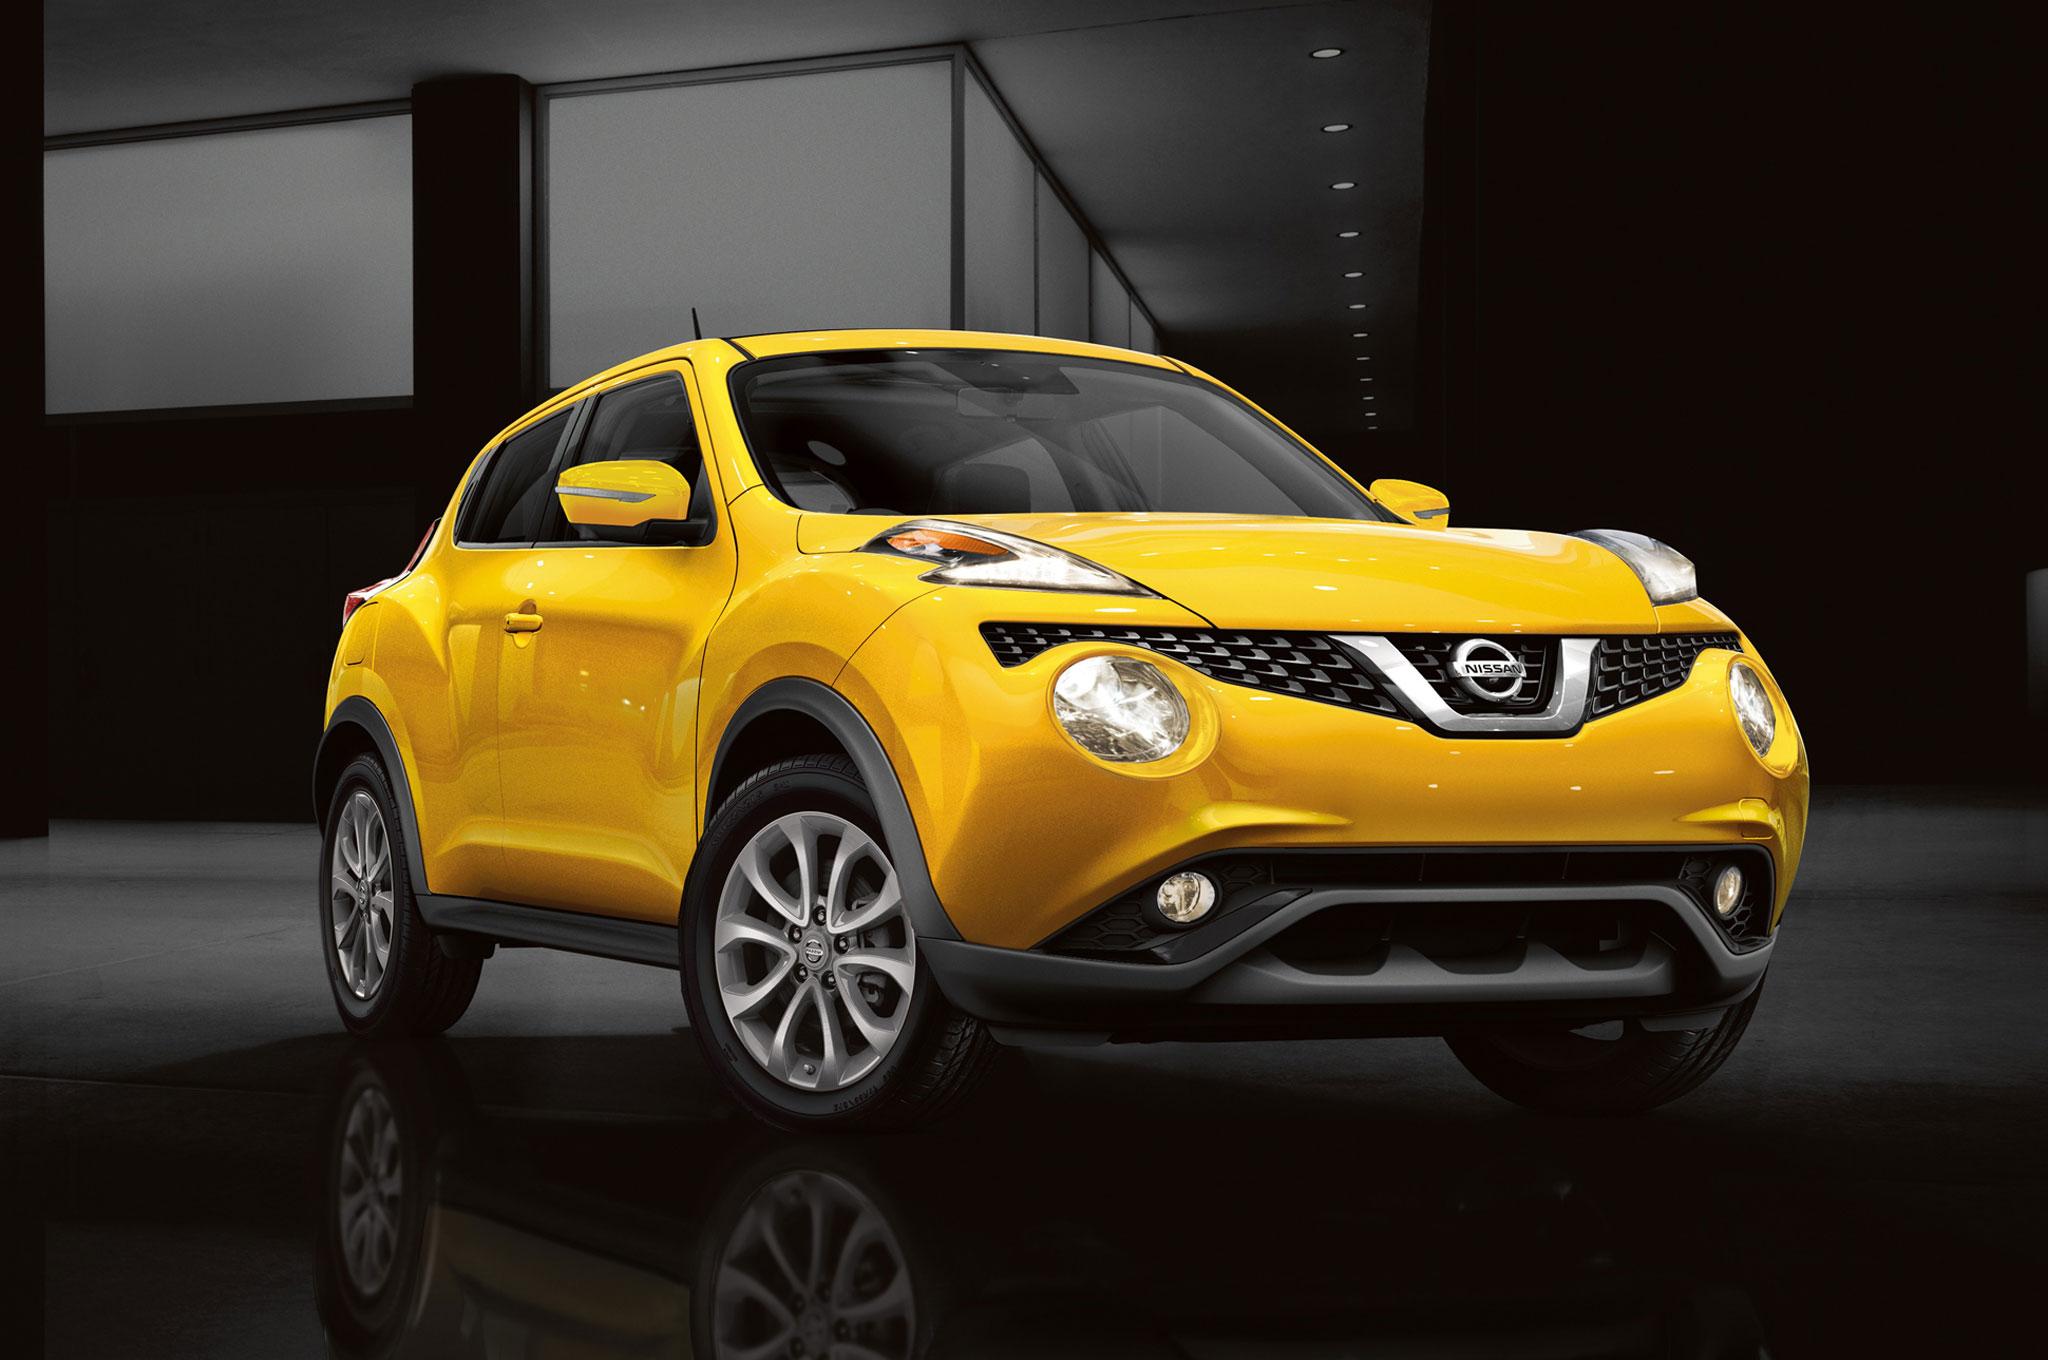 Next-Generation Nissan Juke Confirmed, Uses New Platform